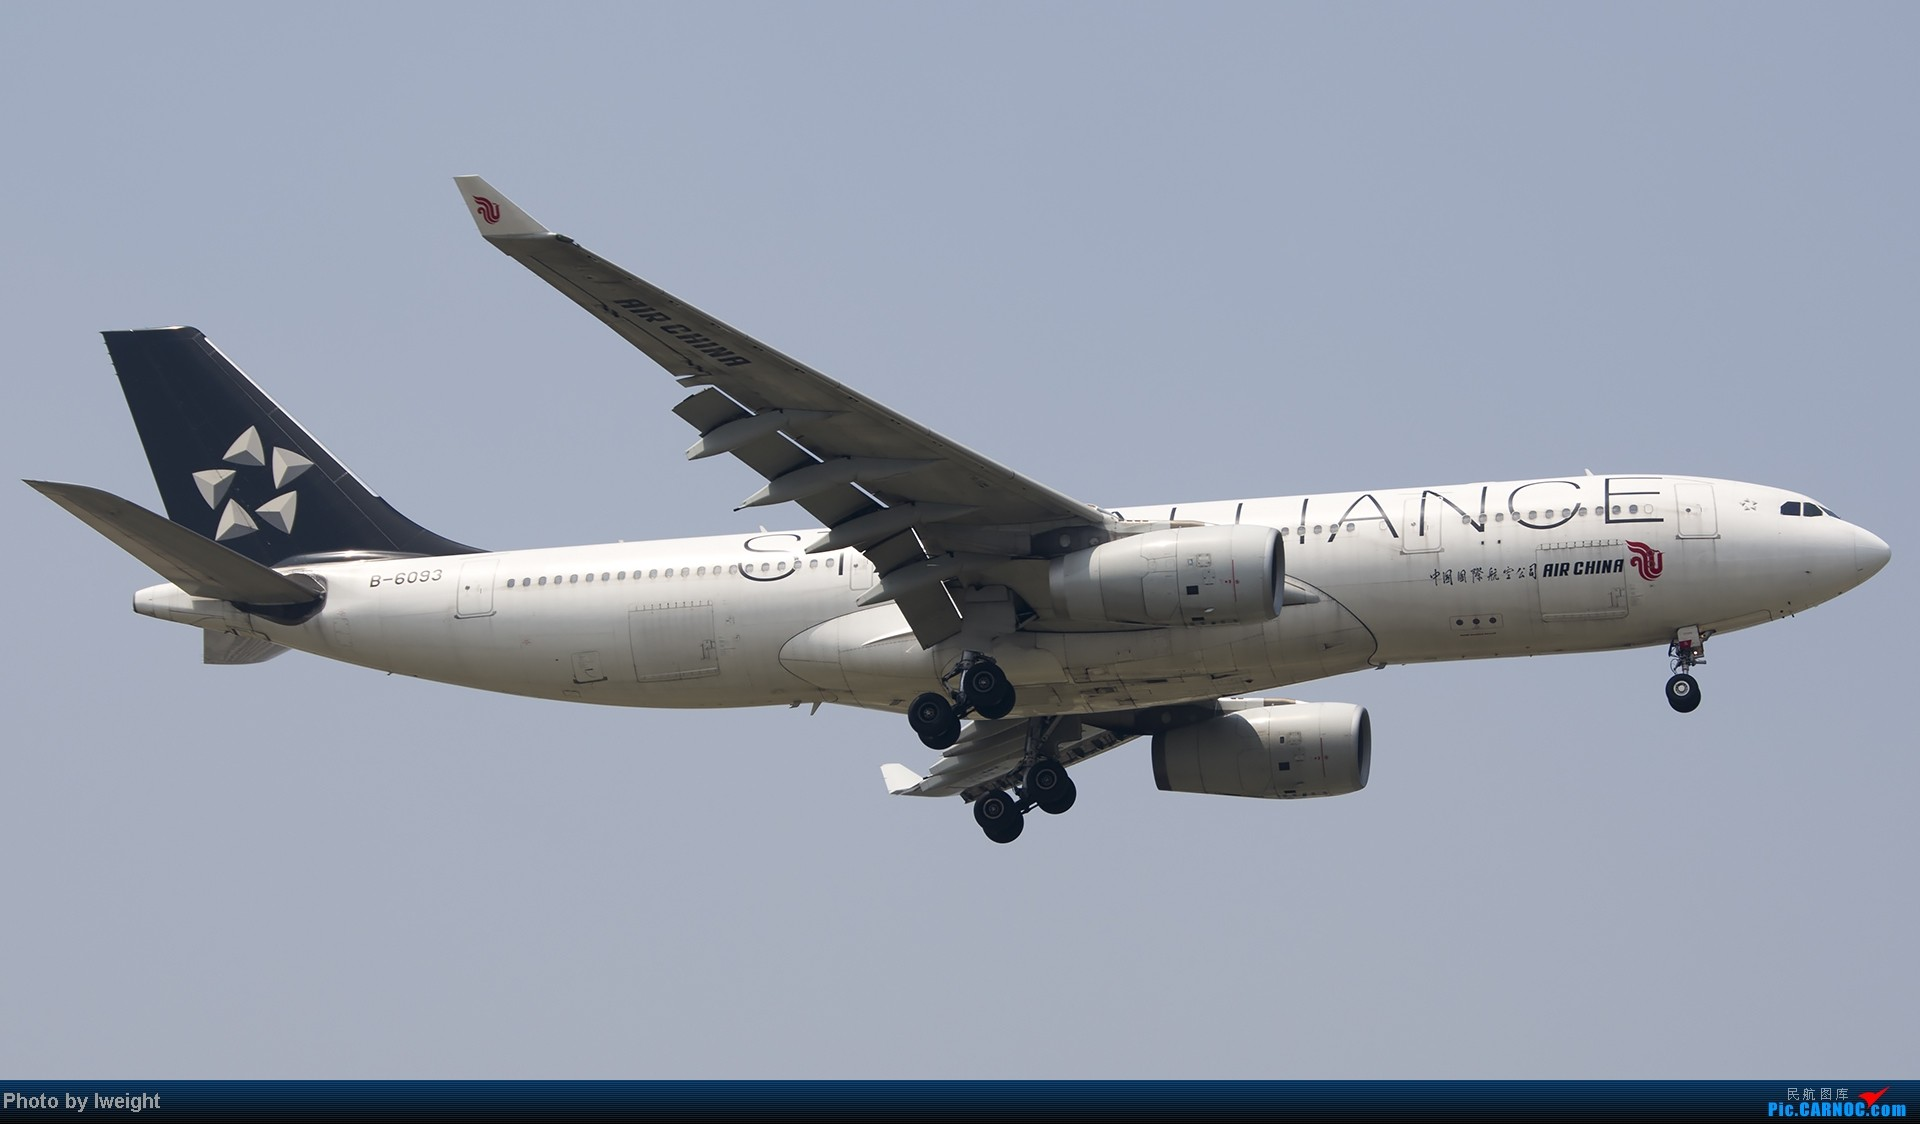 Re:[原创]休假无聊,跑道边来拍机玩(晚点的ZestAir、换装的B6100和刚交付的B2738等) AIRBUS A330-200 B-6093 中国北京首都机场